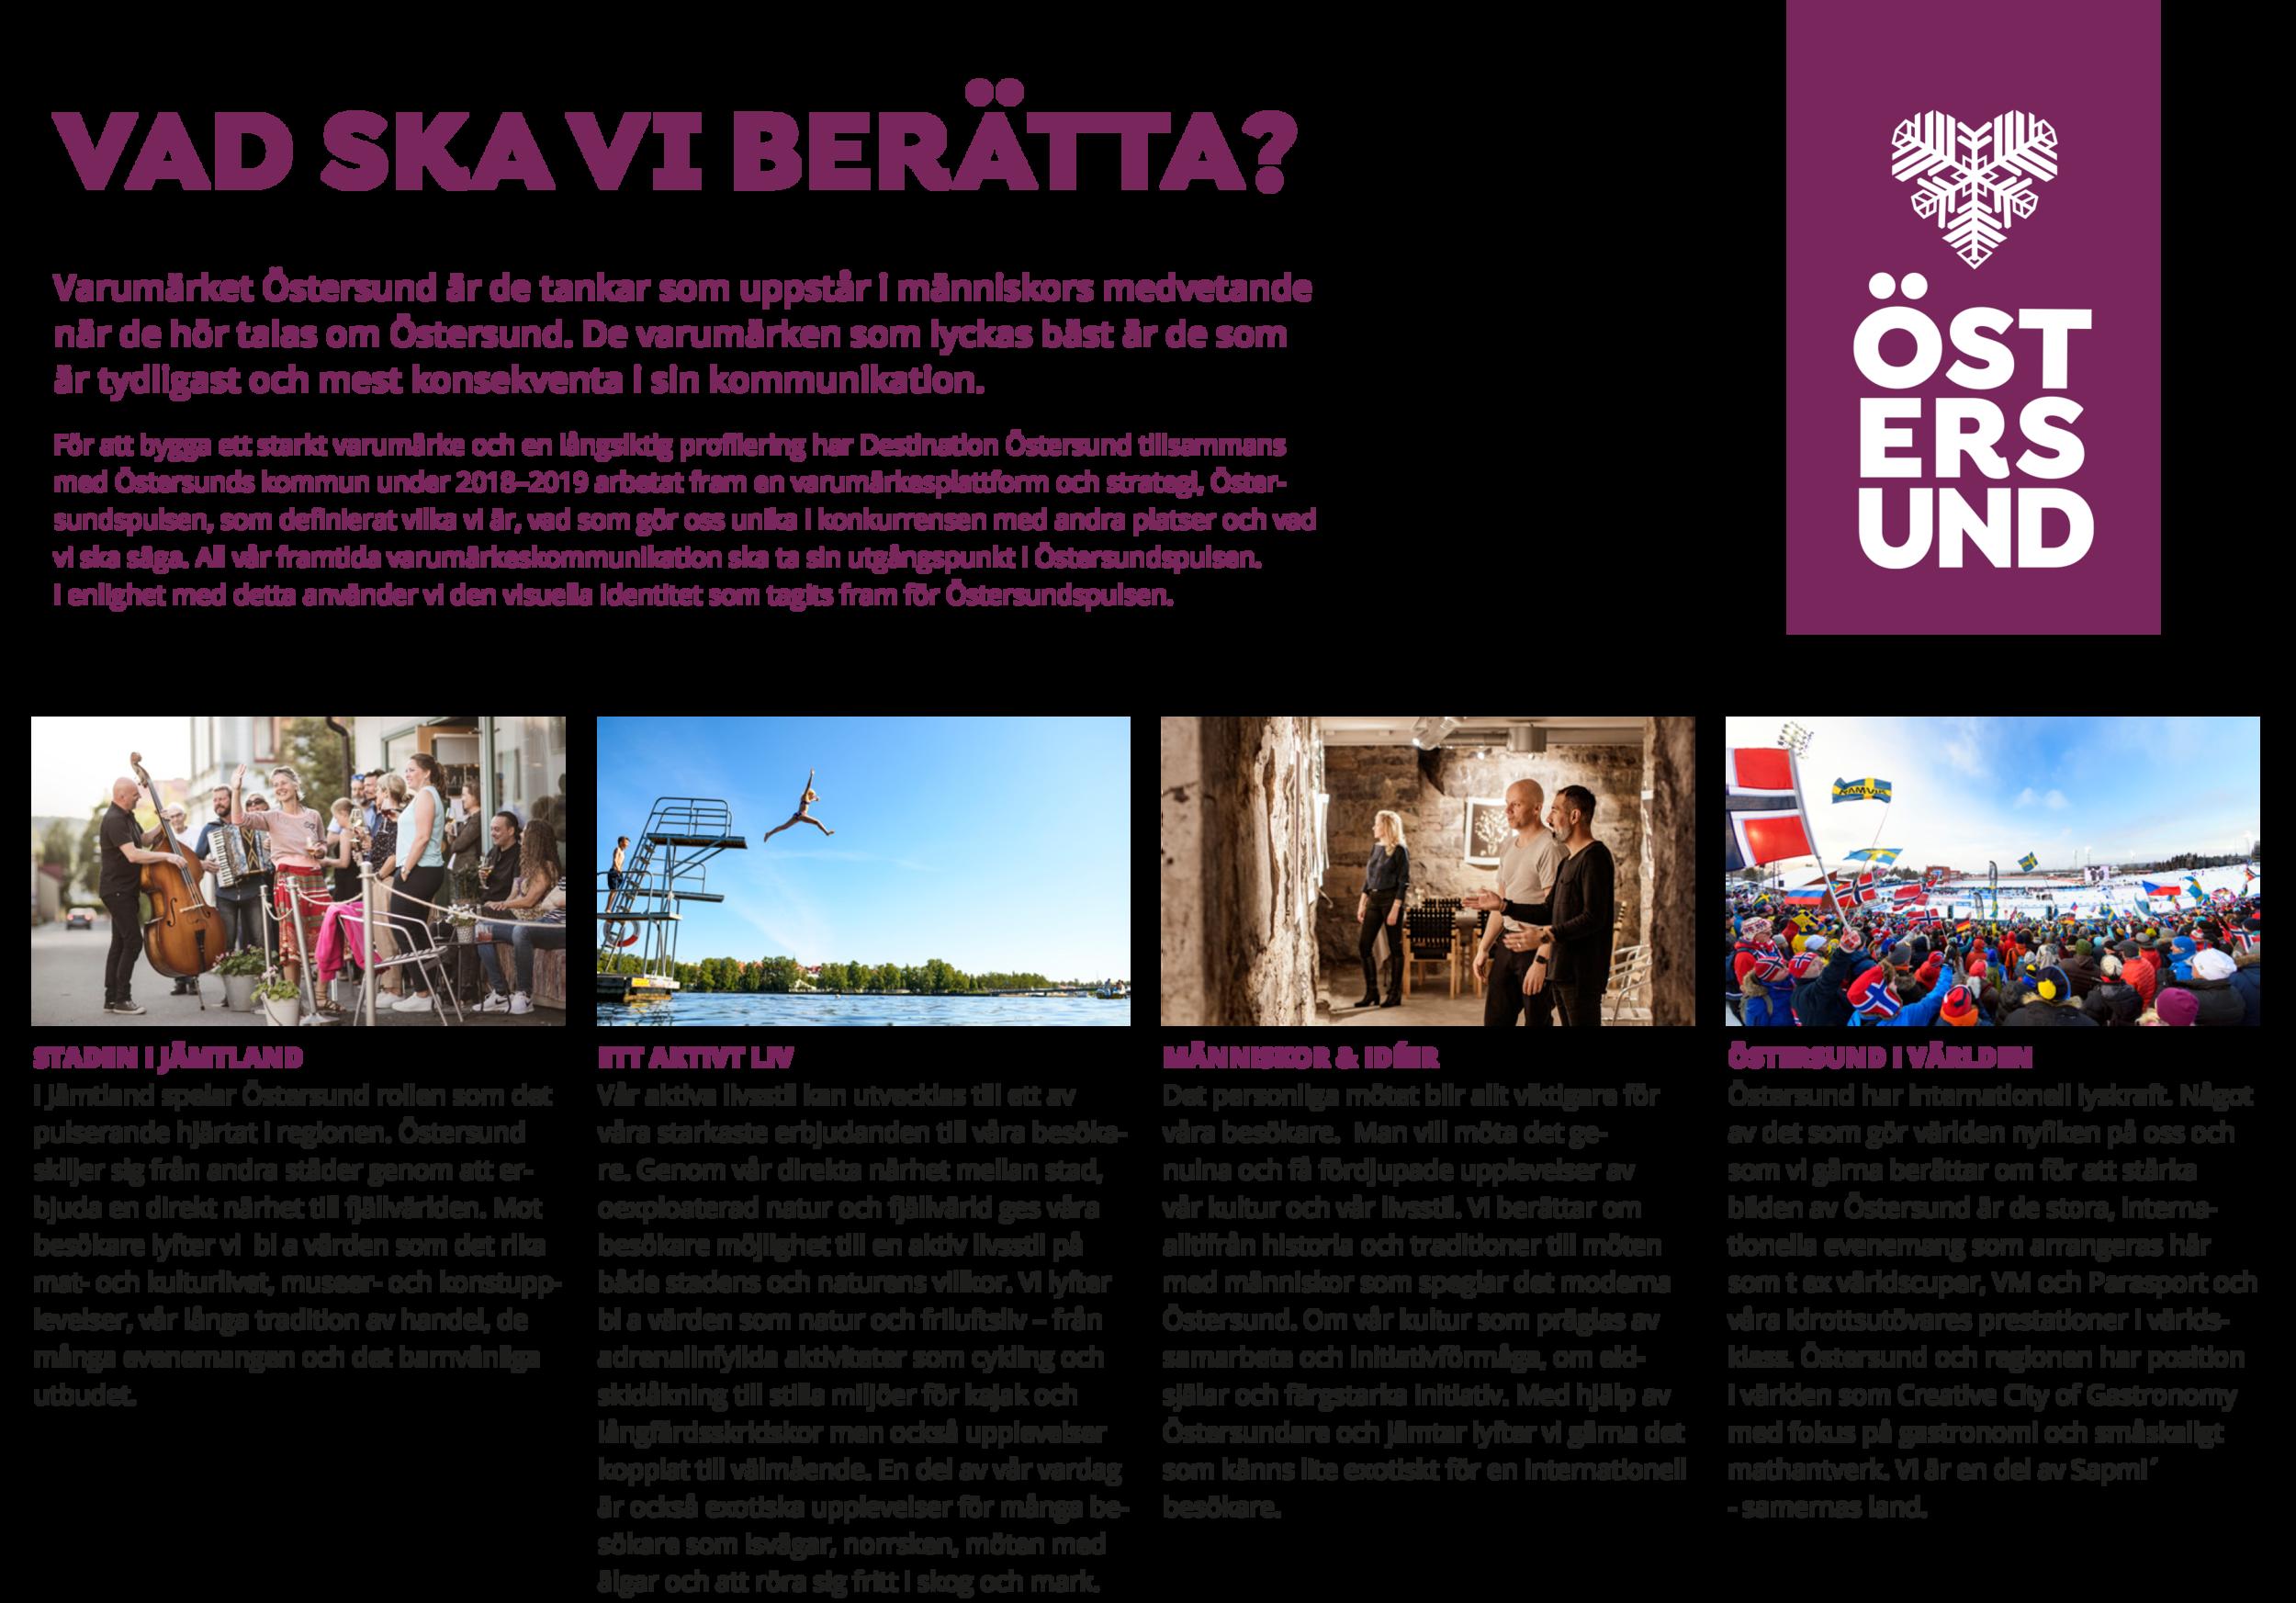 06_Vad_Ska_Vi_Beratta_Destination_Ostersund.png